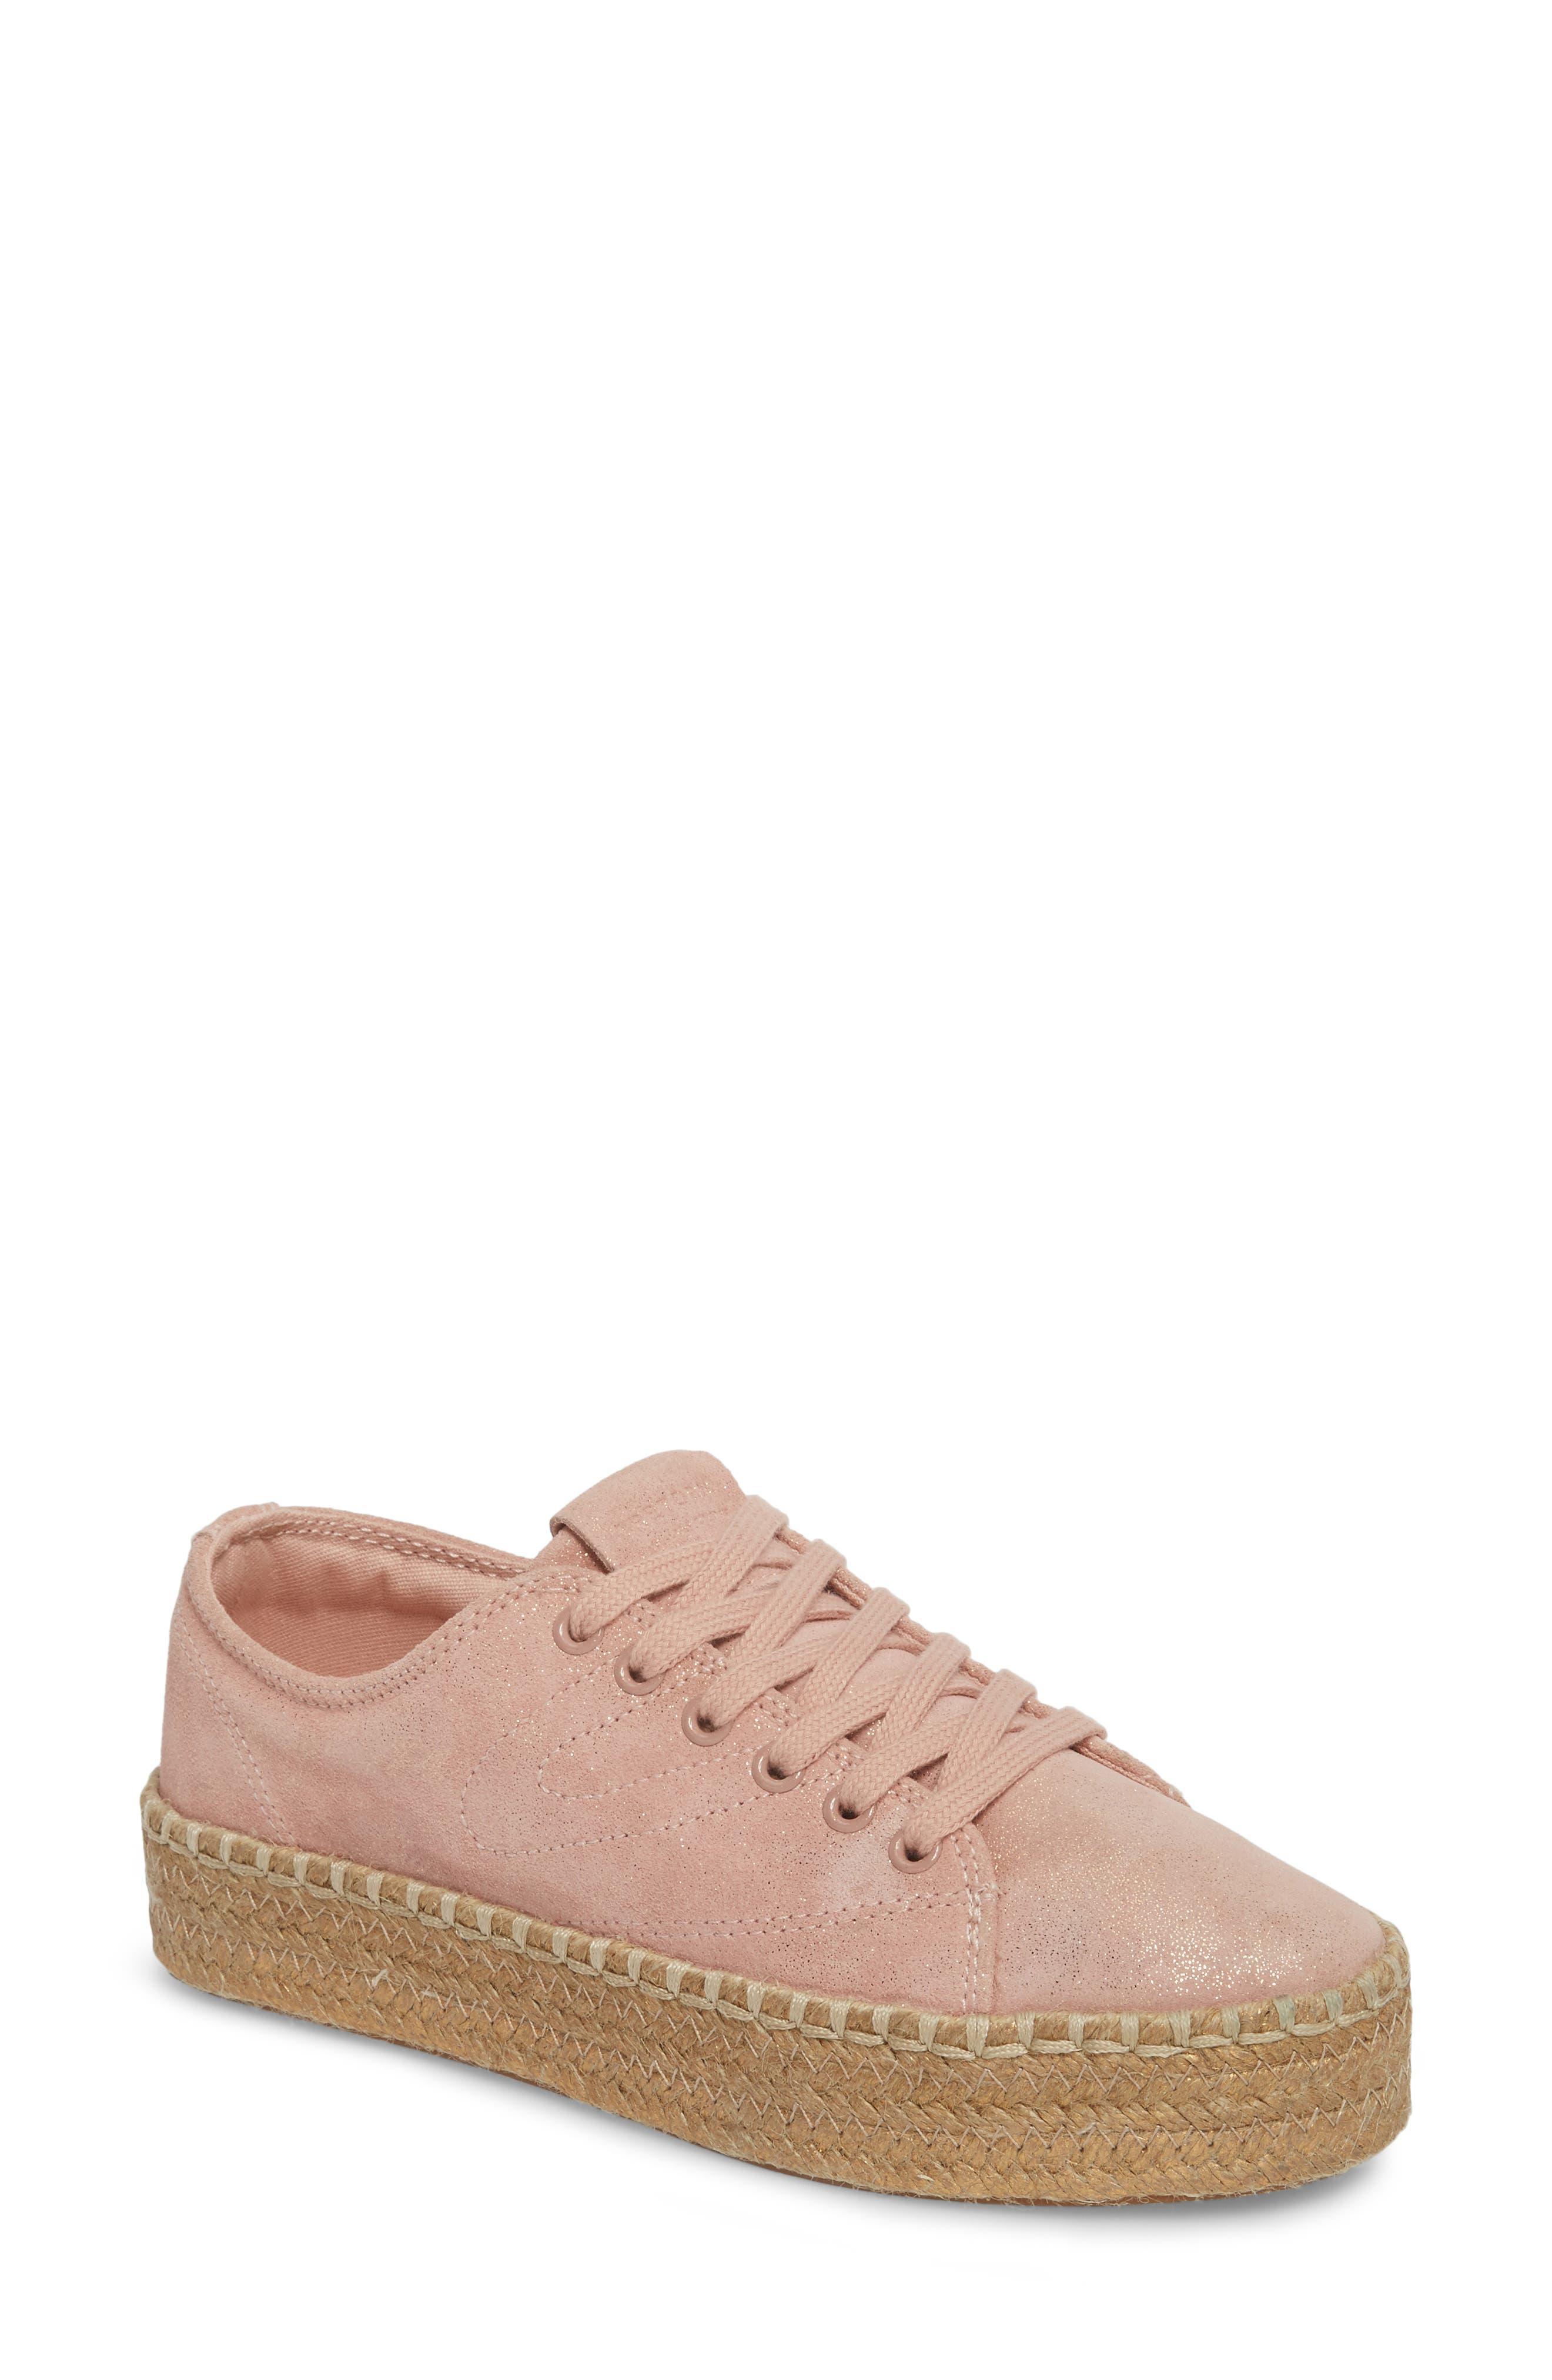 Tretorn Platform Espadrille Sneaker (Women)